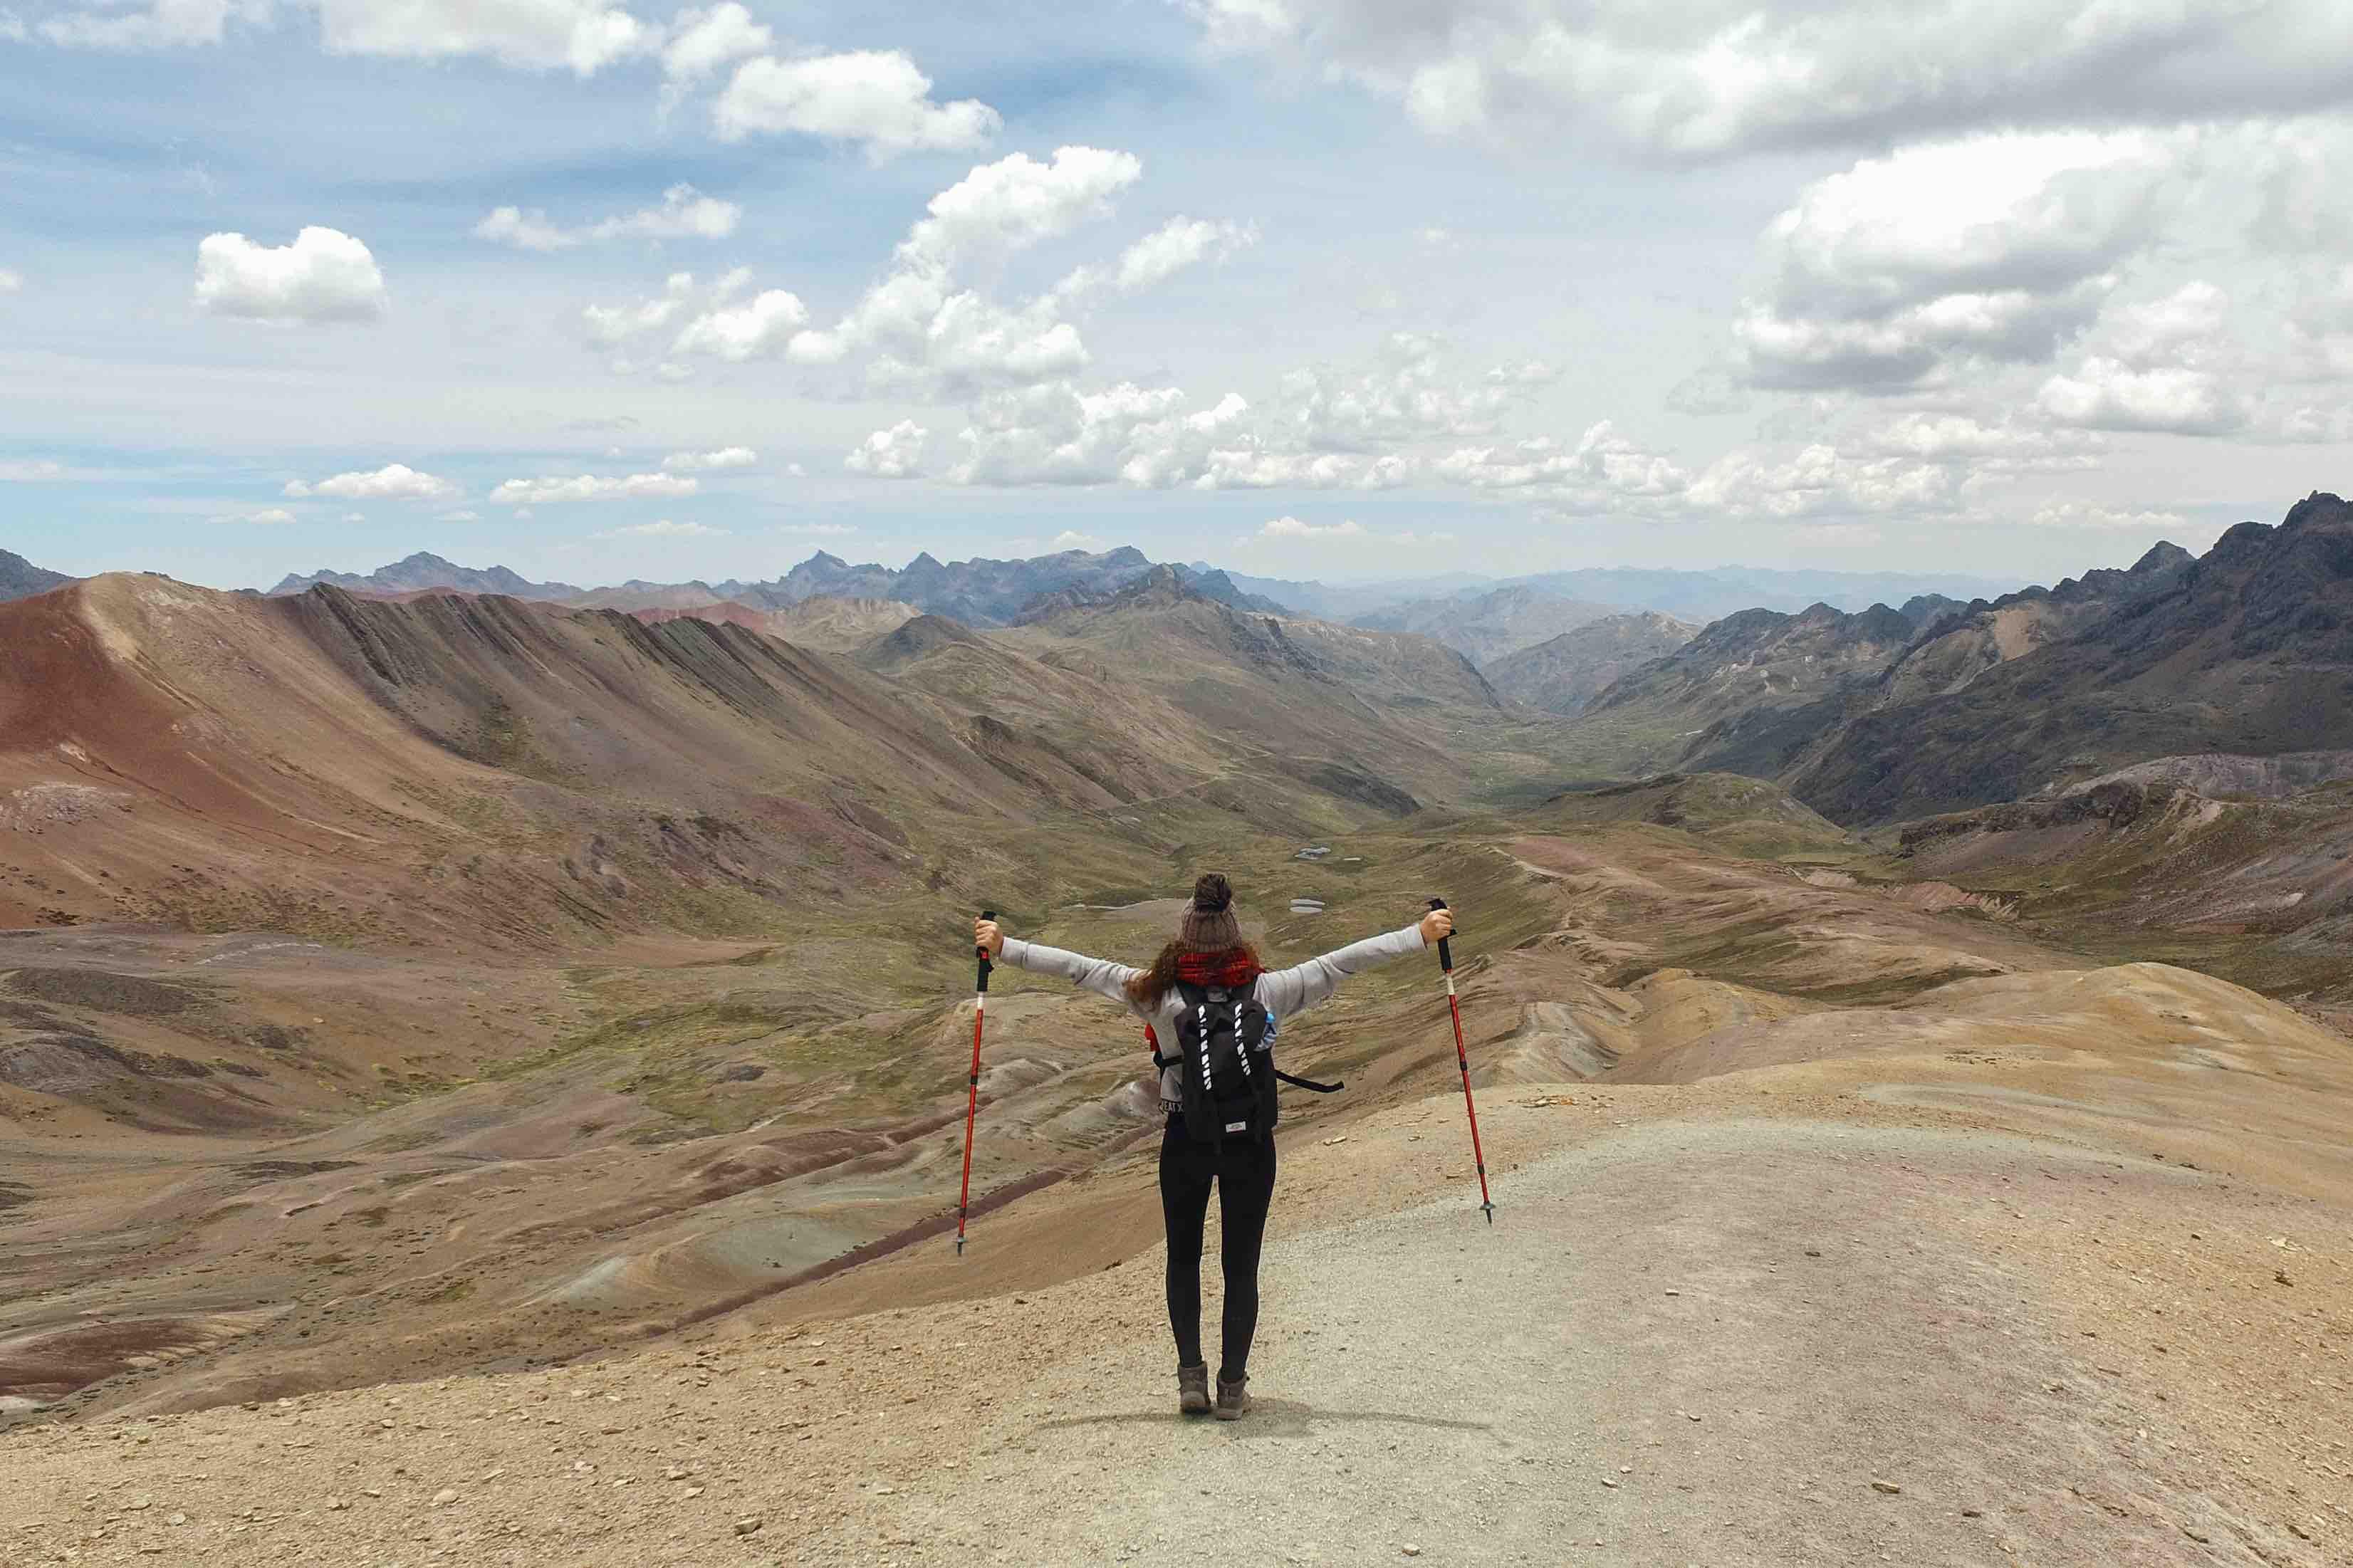 Peru: Po stopách dúhy - Vinicunca Rainbow Mountain